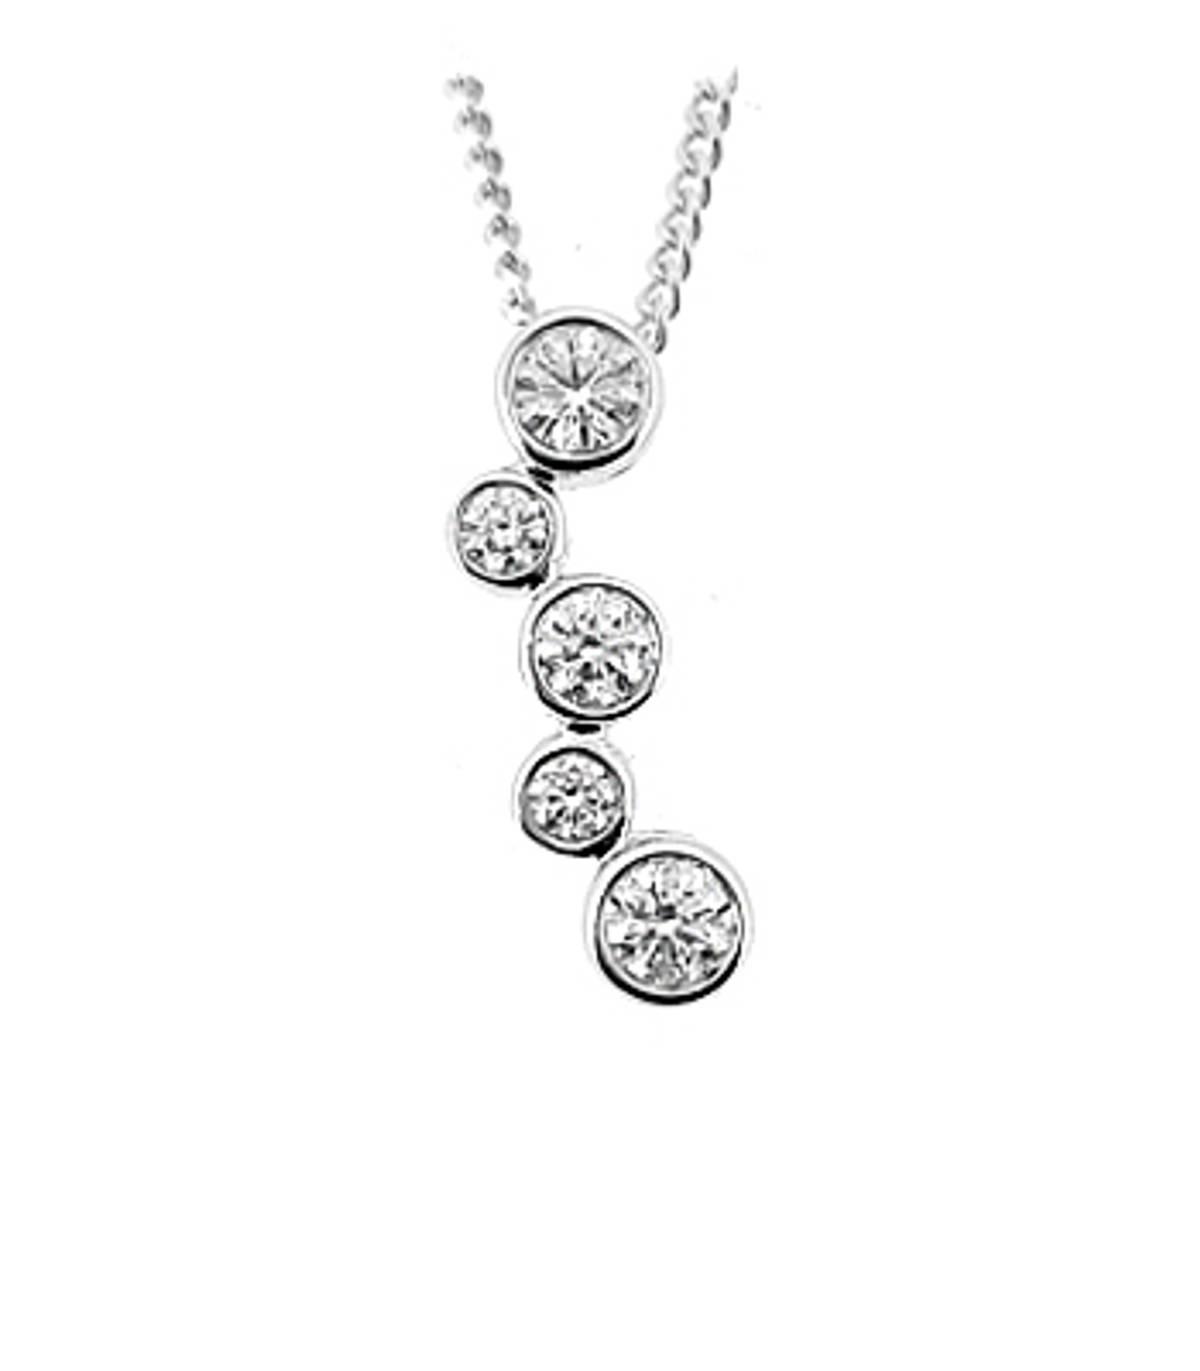 DP38345 stone diamond rubover set drop pendantPictured item: total 0.50ct brilliant cut diamond set in 18k white goldAvailable in: 18k gold